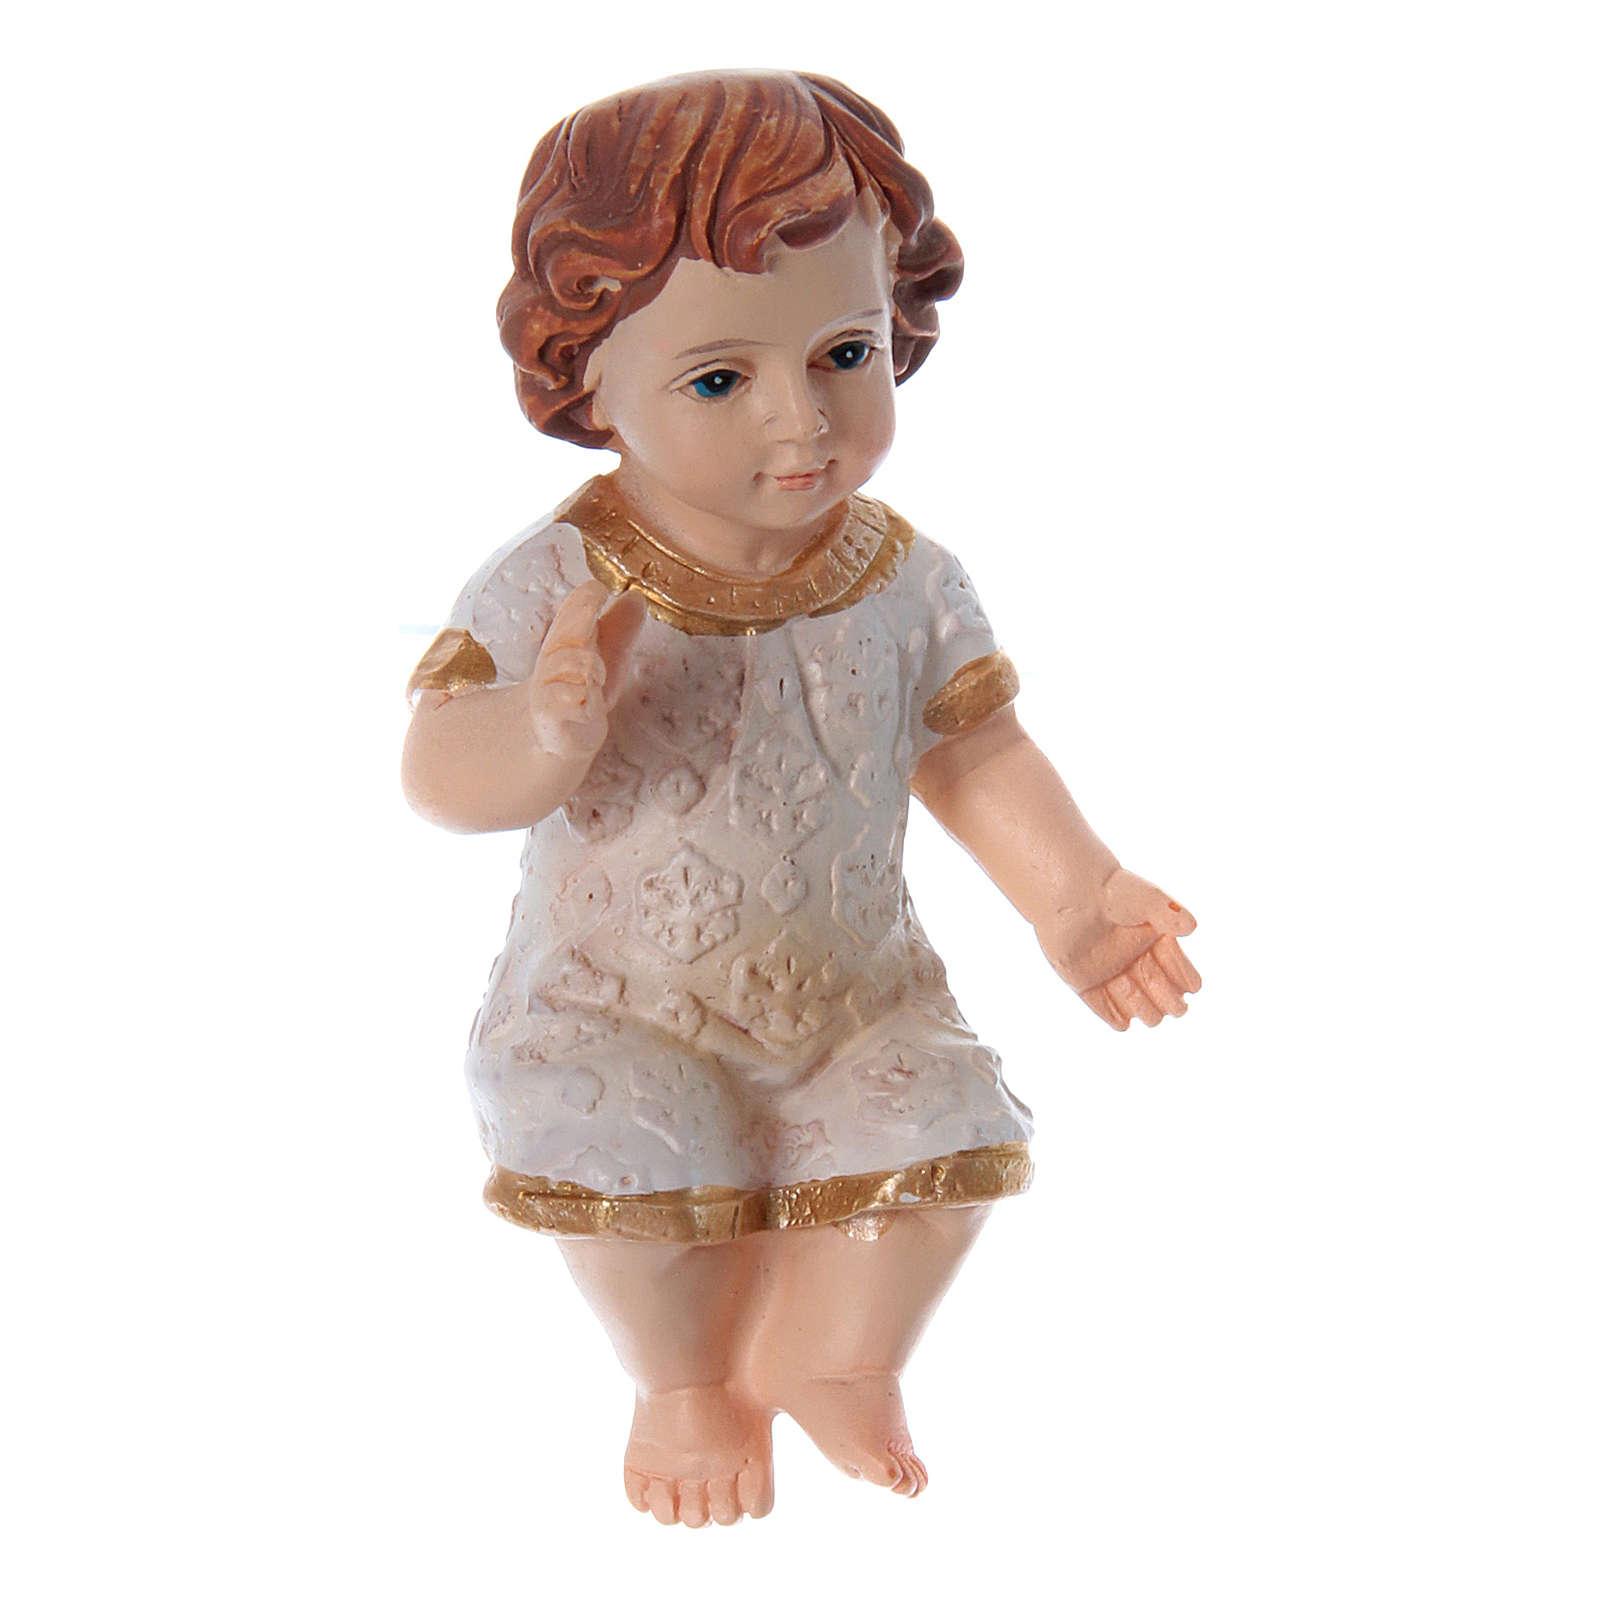 Niño Jesús vestido de resina h real 5 cm 3